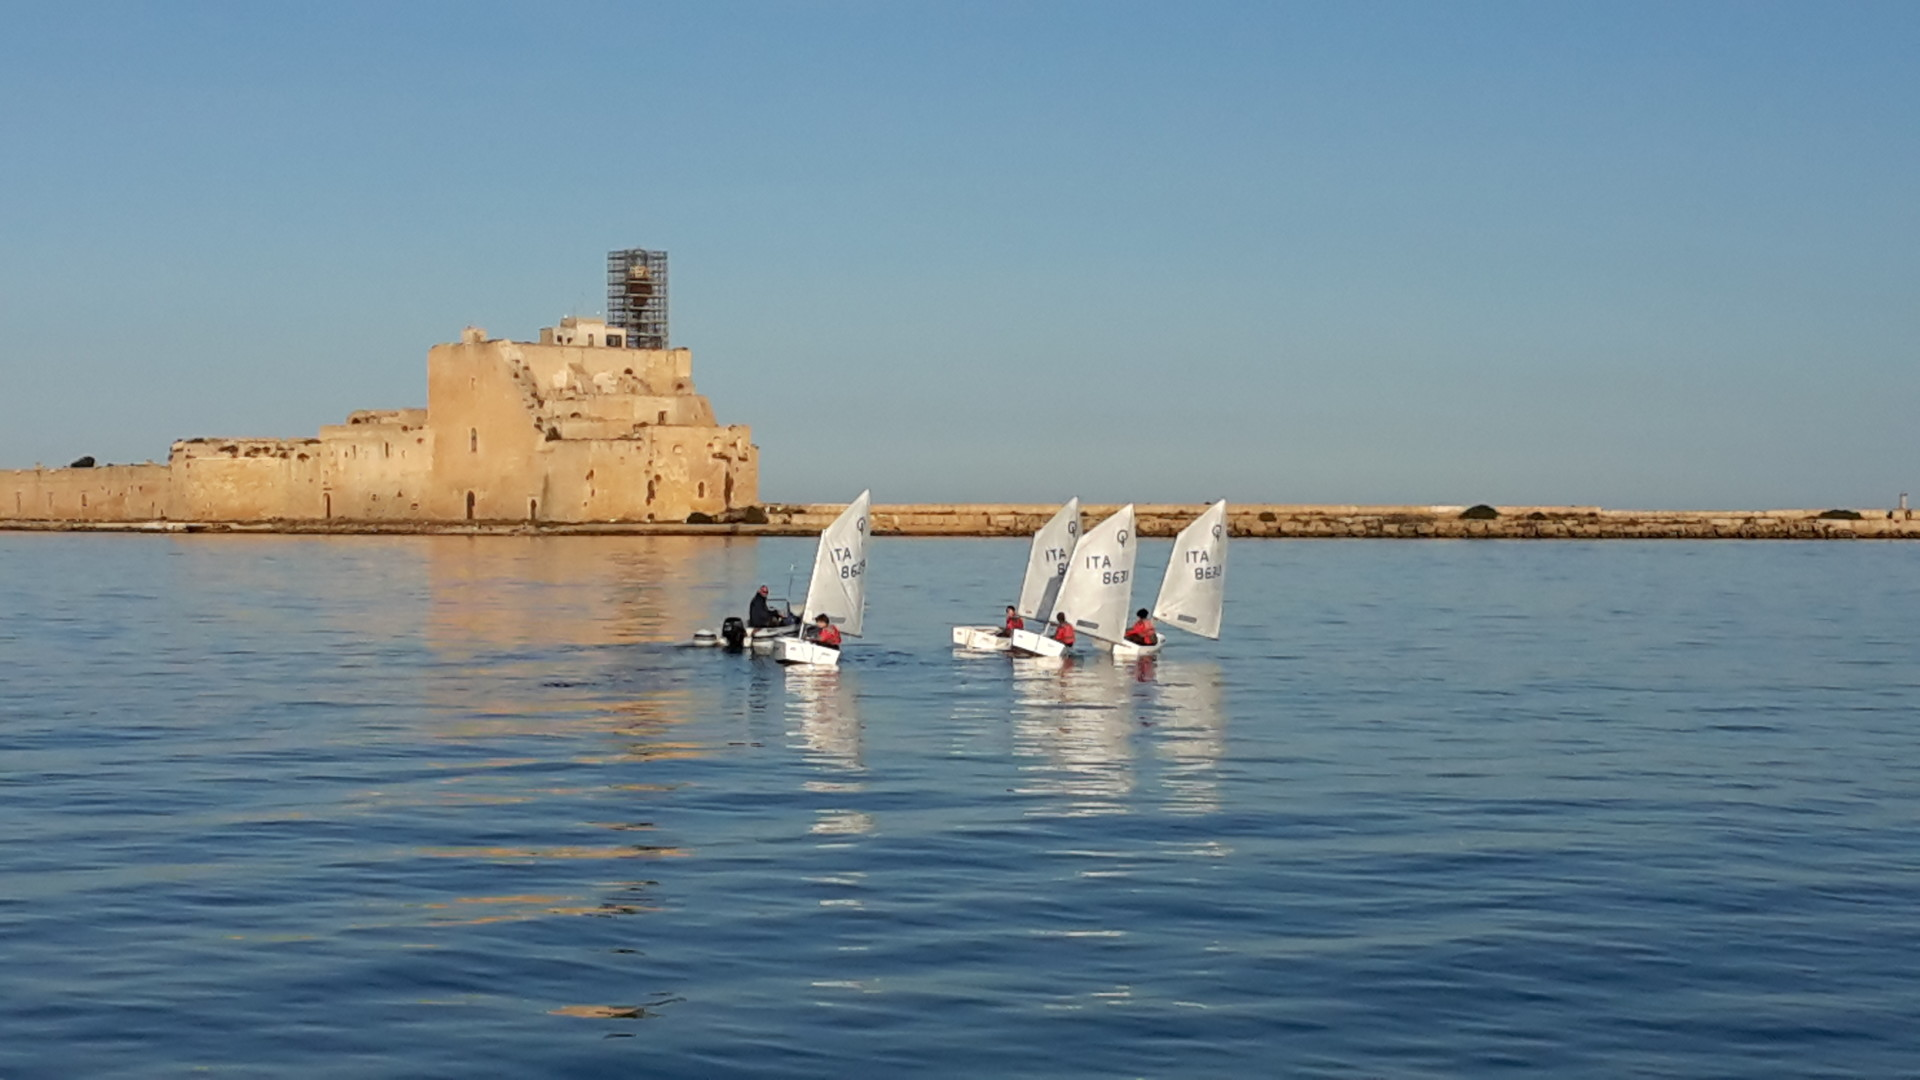 Scuola-di-vela-lega-navale-LNI-Brindisi (2)